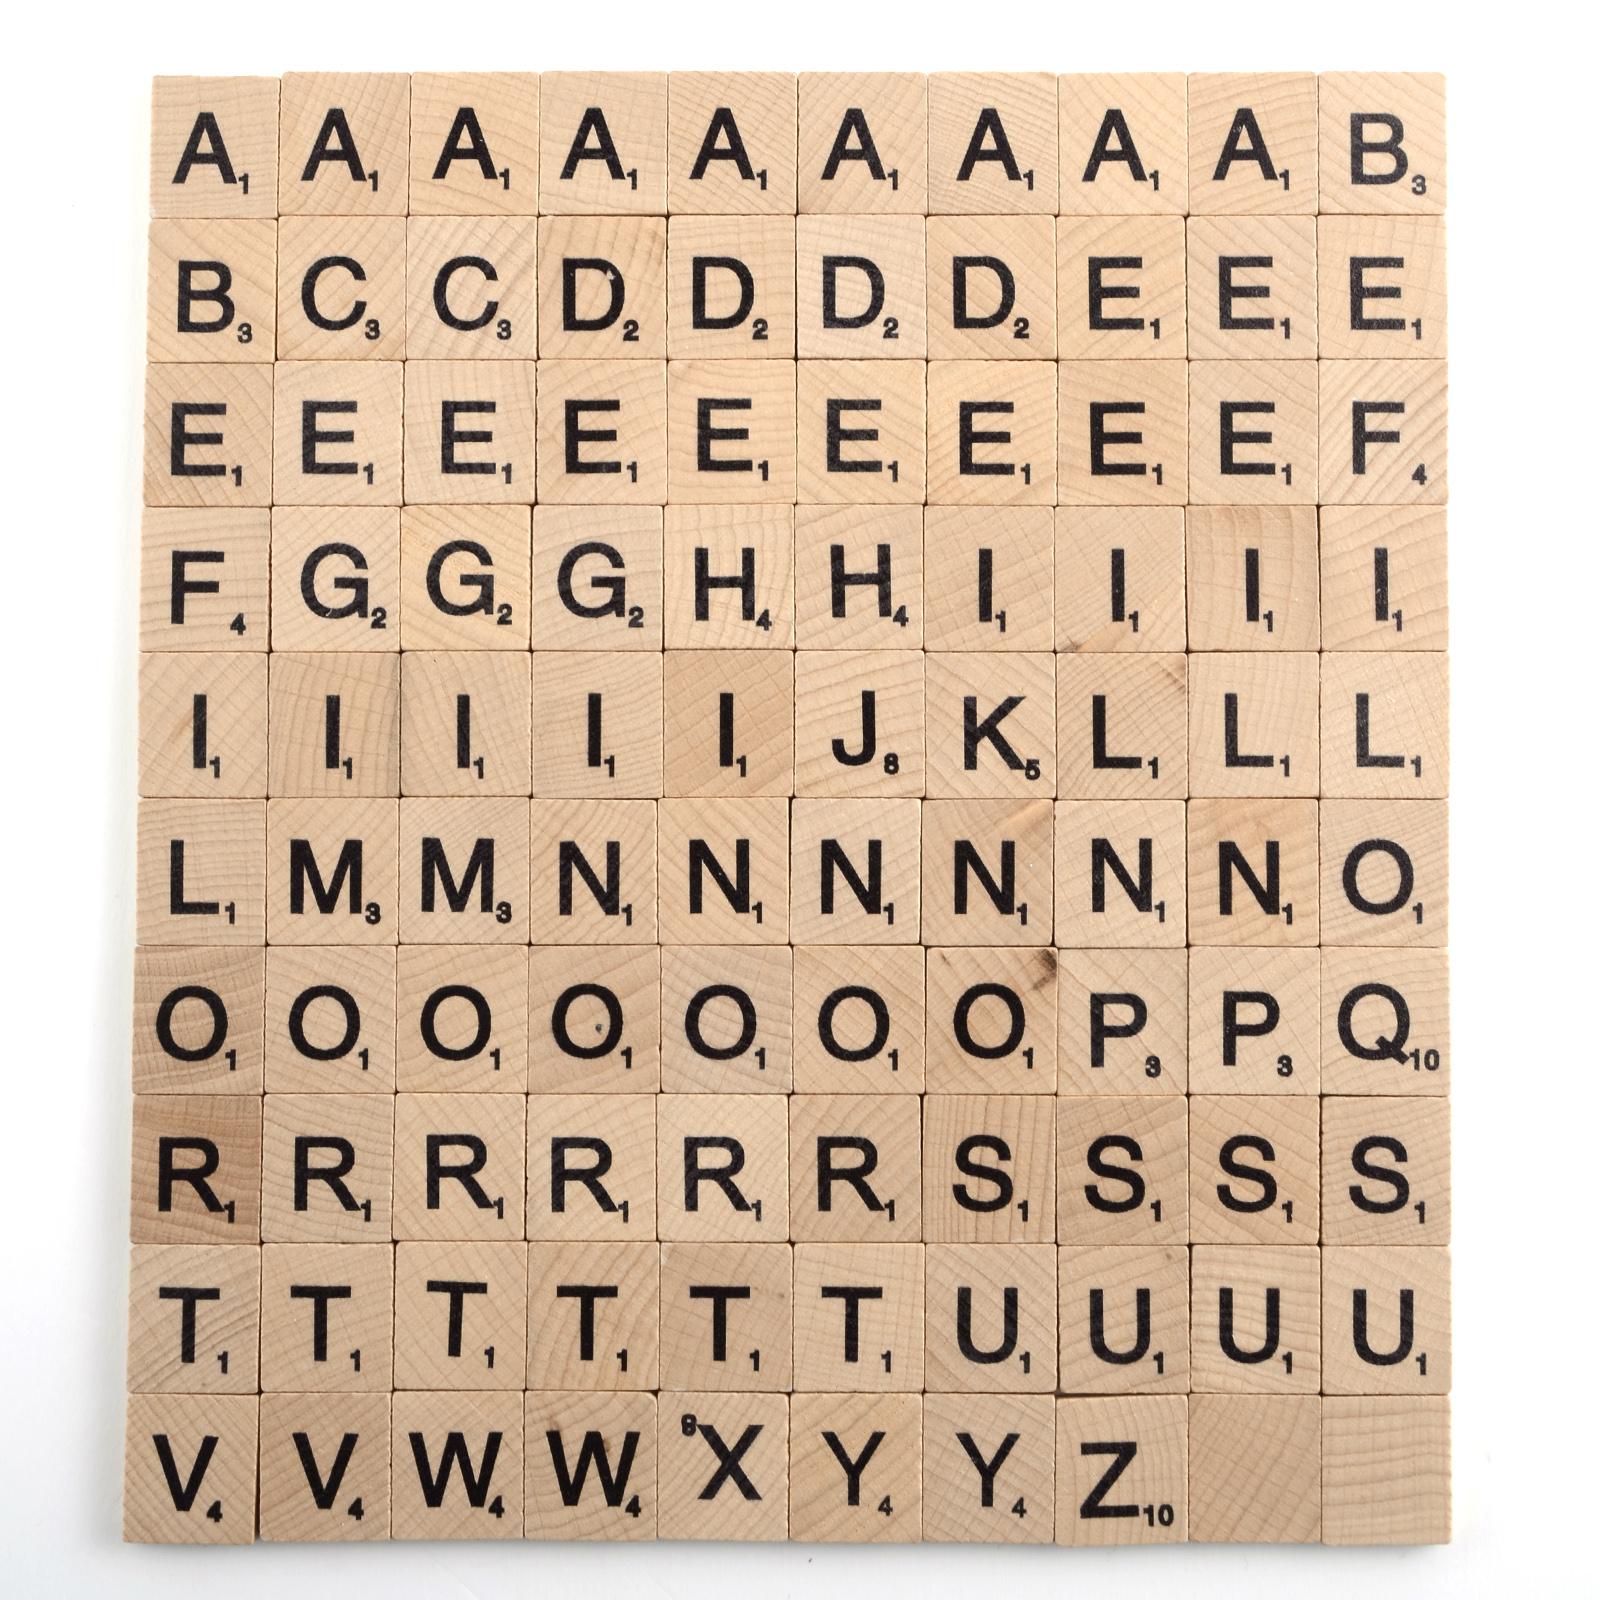 lettre scrabble Scrabble Letter Tiles For Crafts.100pcs New Wooden Scrabble Tiles  lettre scrabble